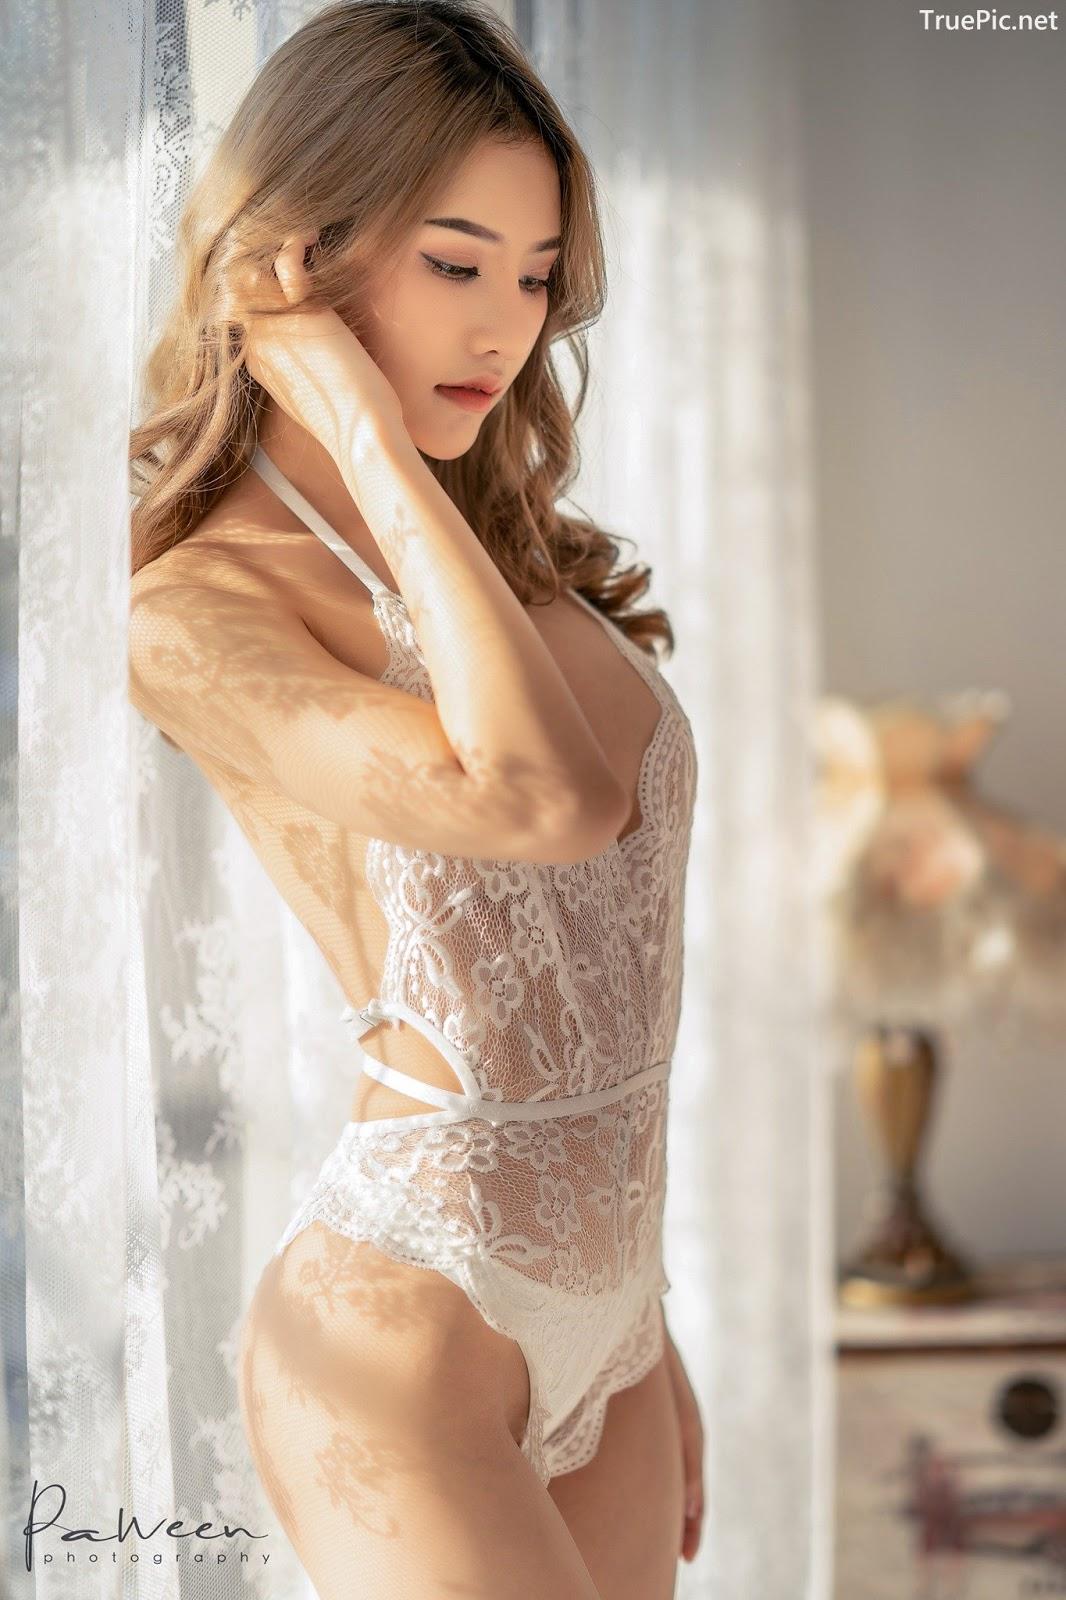 Image Thailand Model - Atittaya Chaiyasing - White Lace Lingerie - TruePic.net - Picture-2